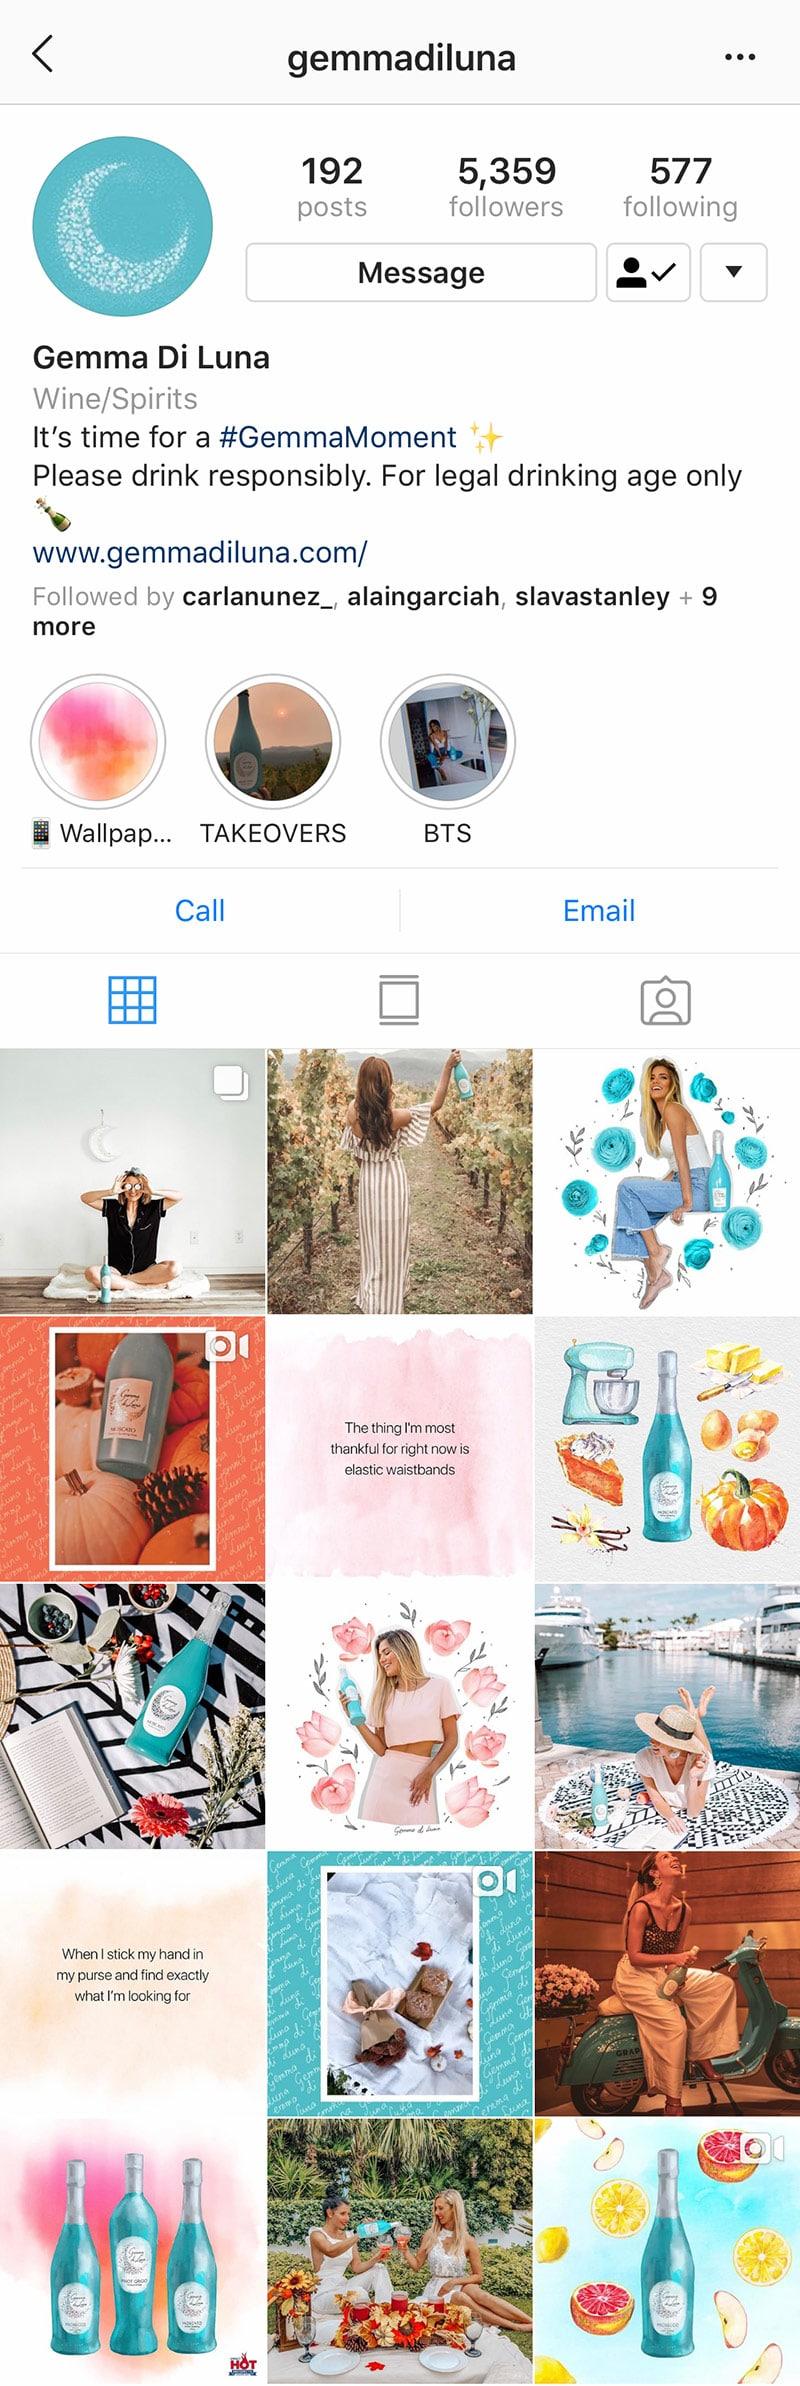 example-of-instagram-account